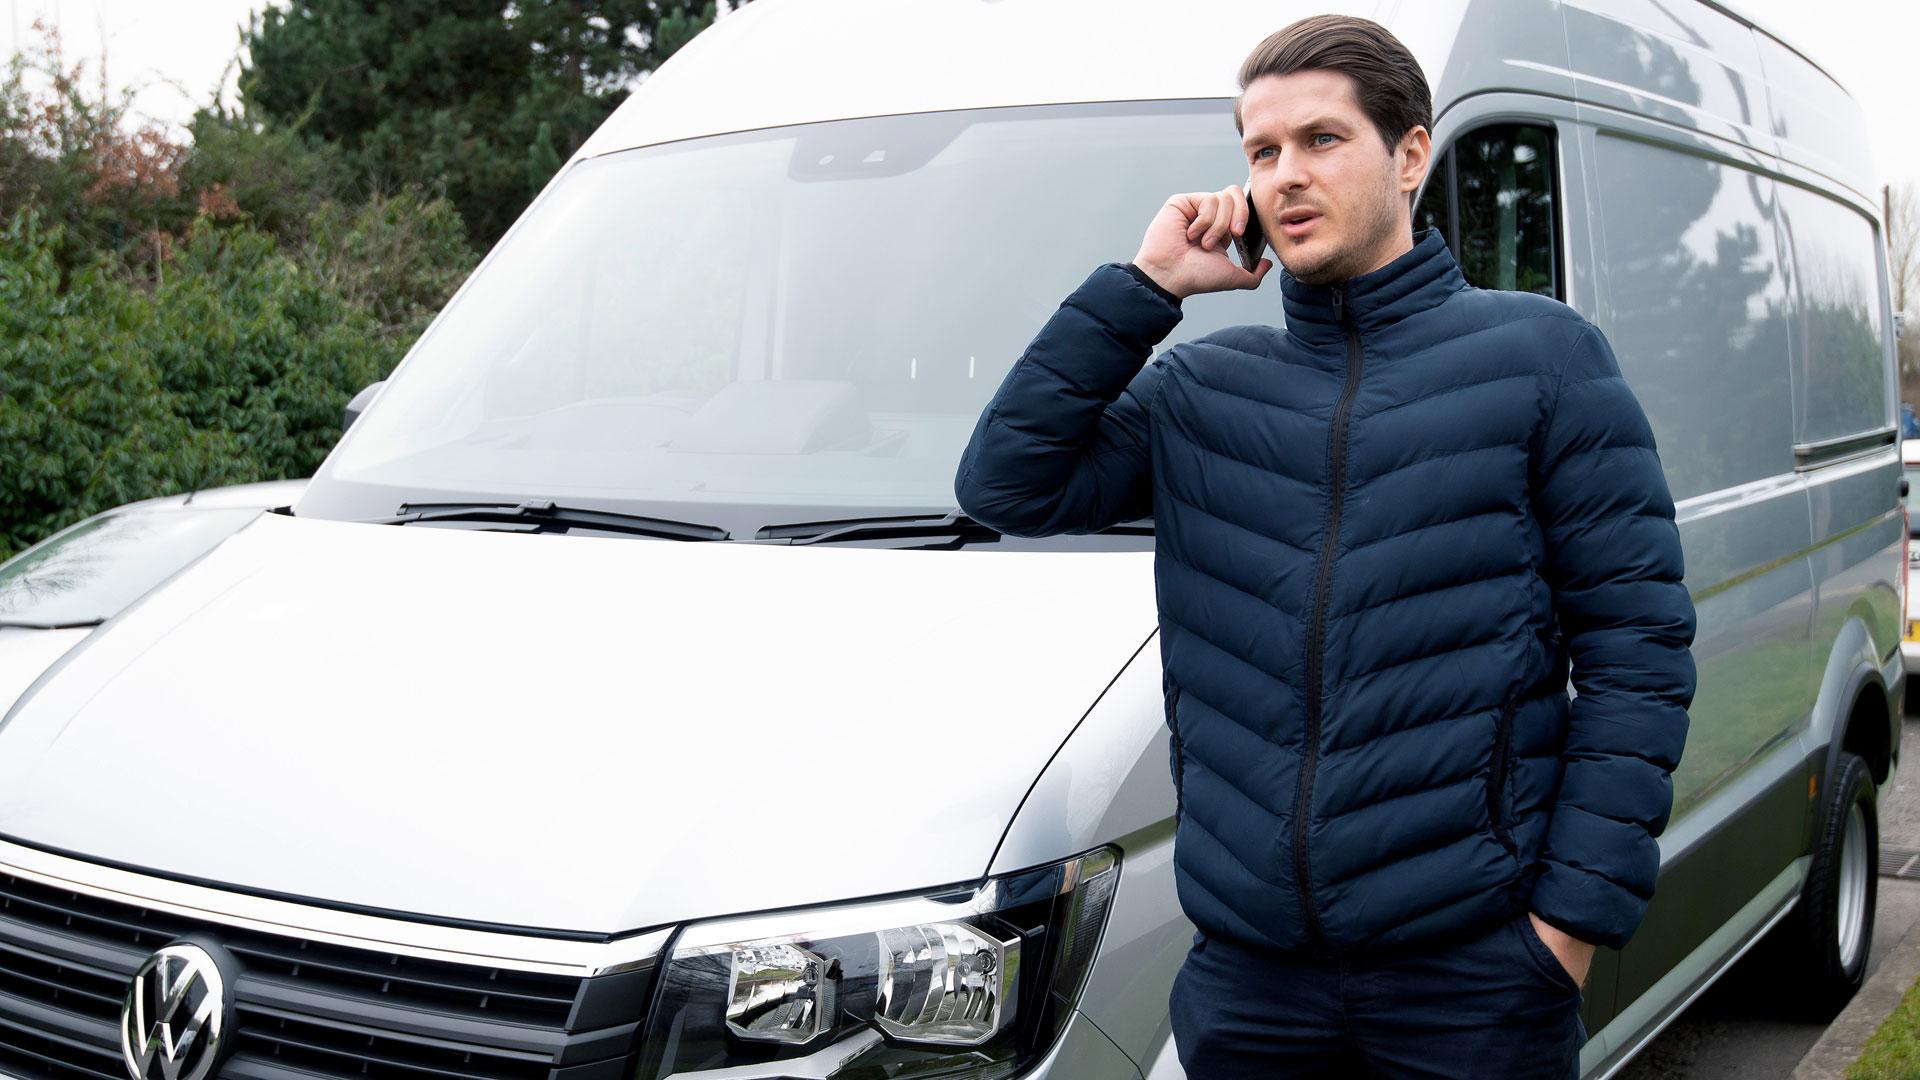 Van driver making a call